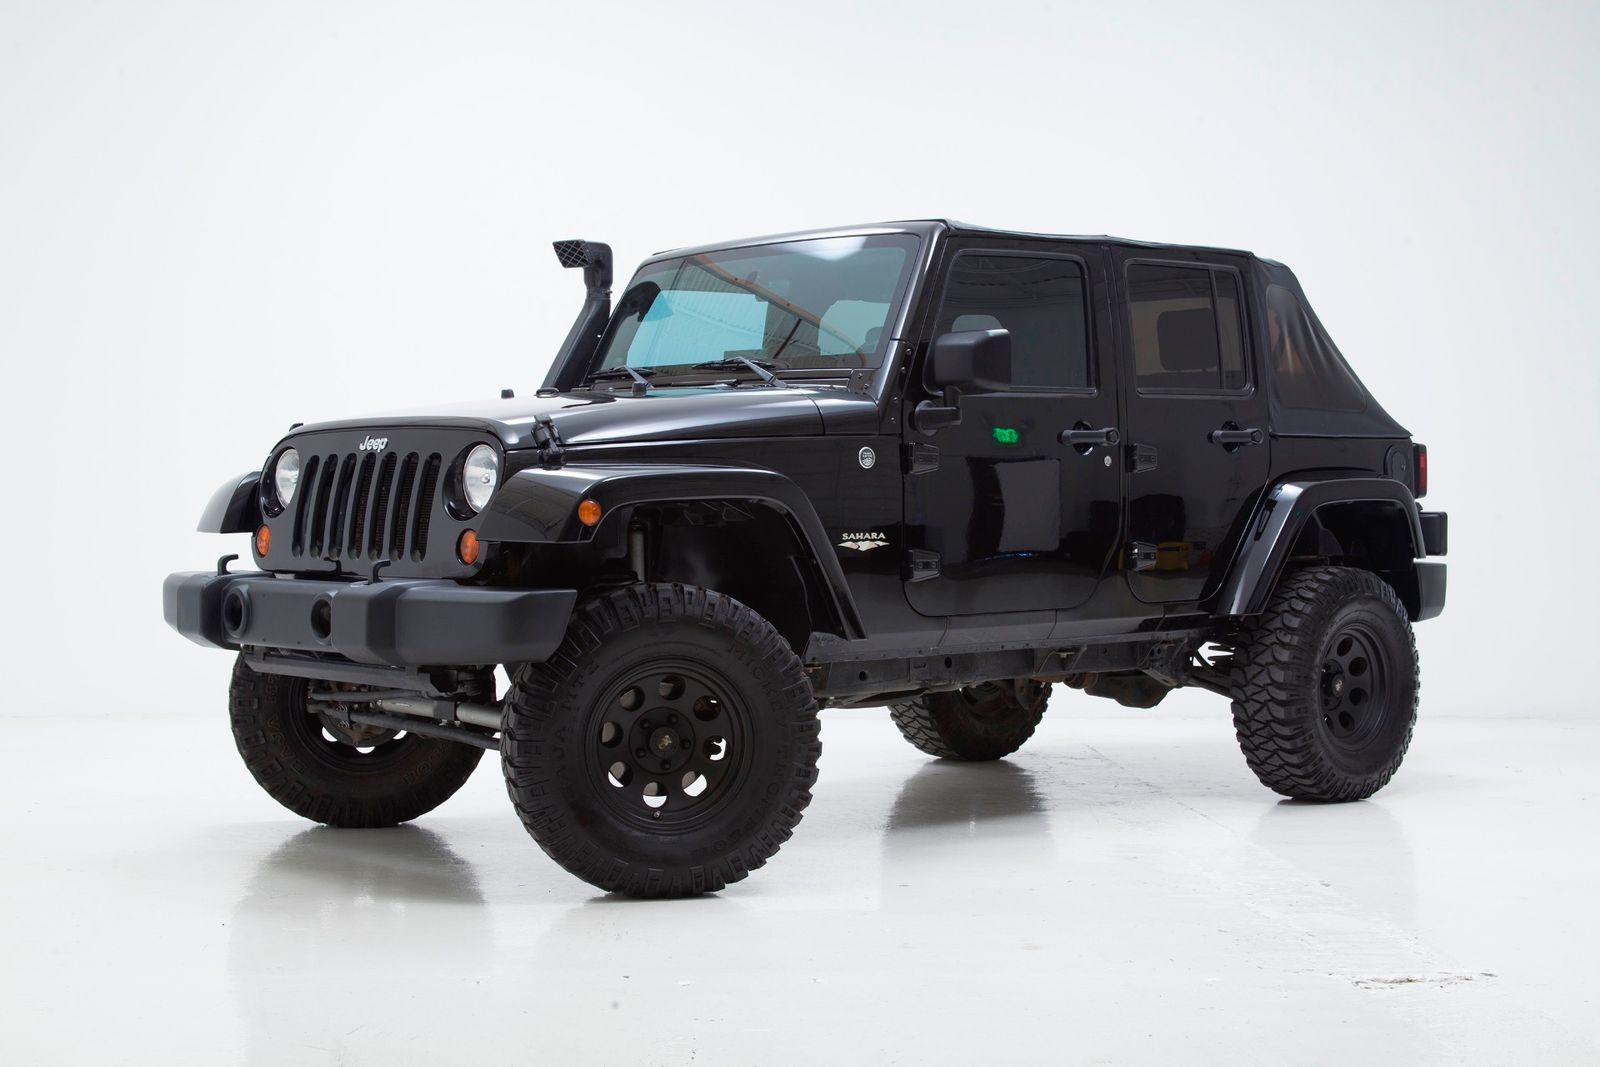 2008 jeep wrangler unlimited sahara lifted with many upgrades